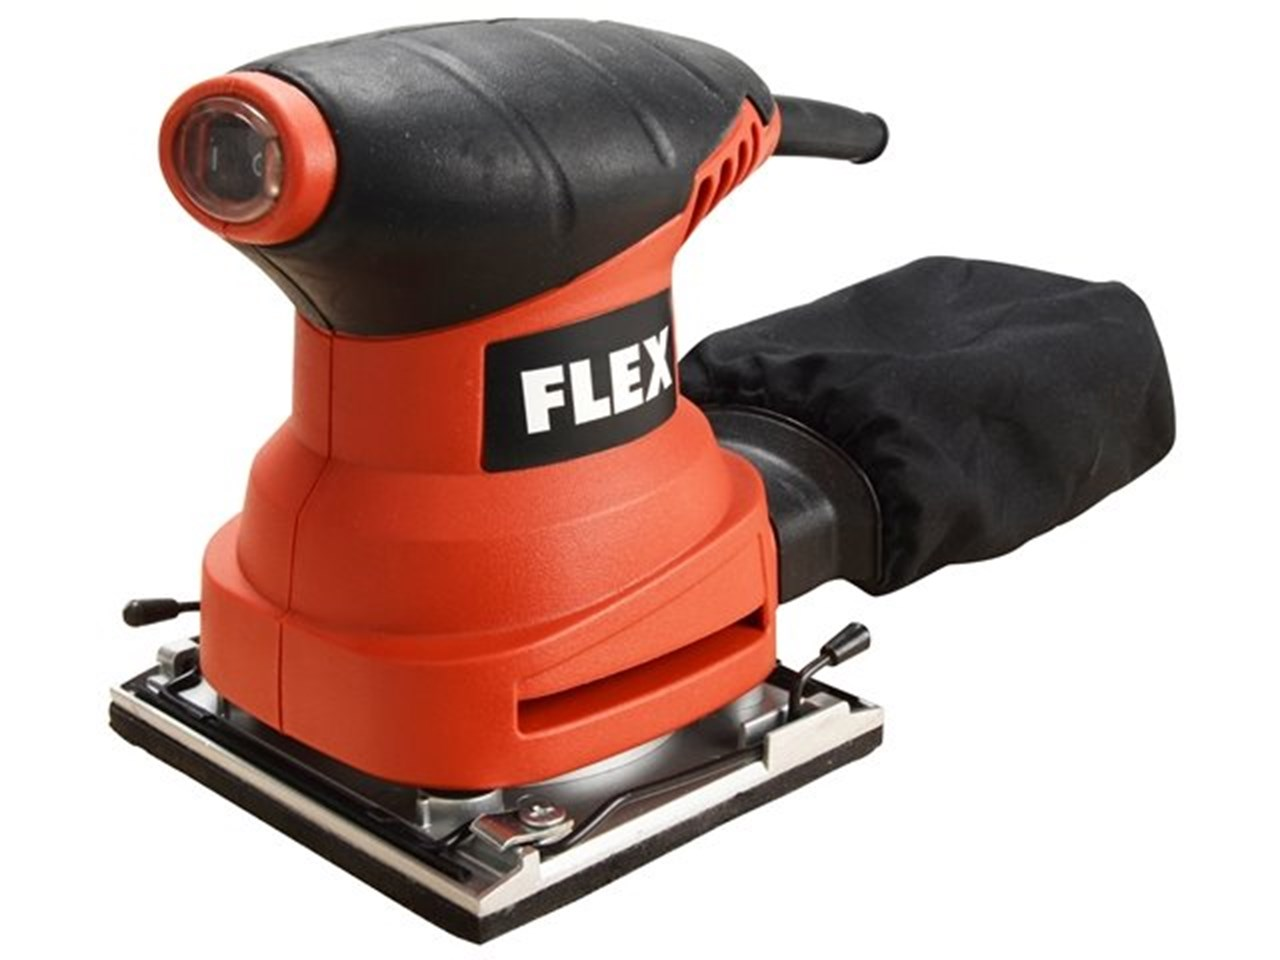 Flex MS713 230v Mini Palm Sander